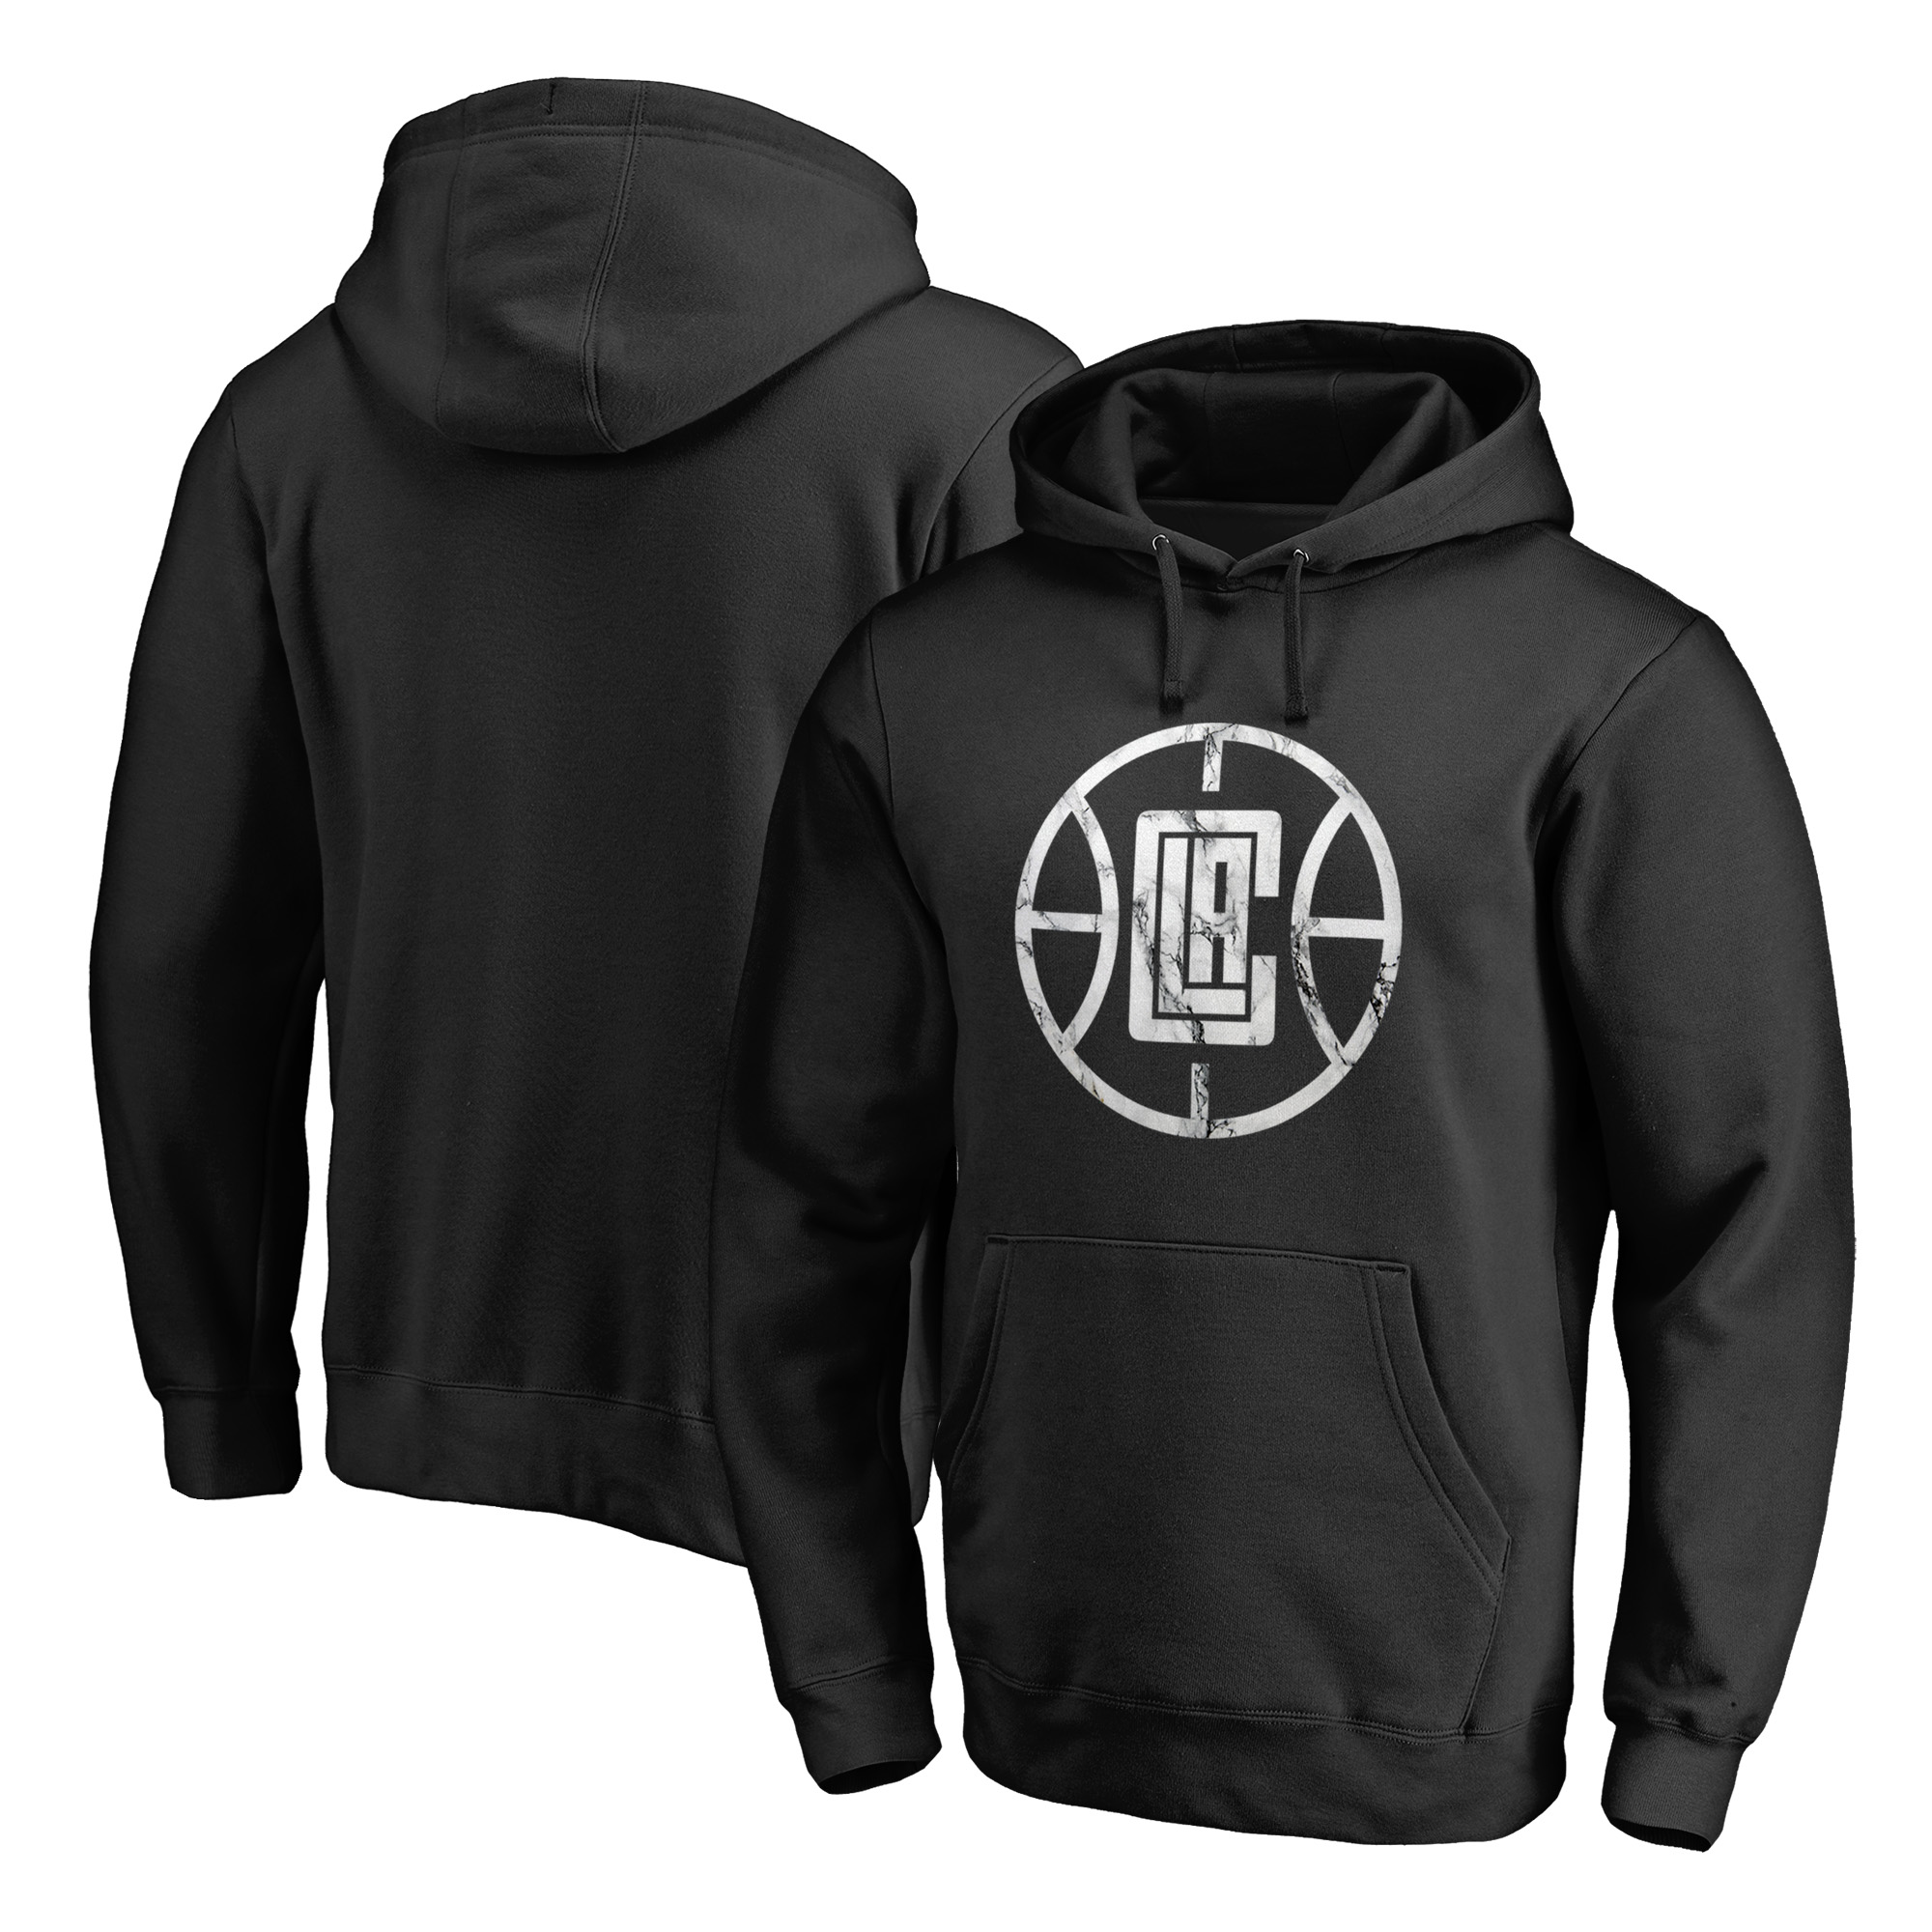 LA Clippers Fanatics Branded Marble Logo Pullover Hoodie - Black - XXL